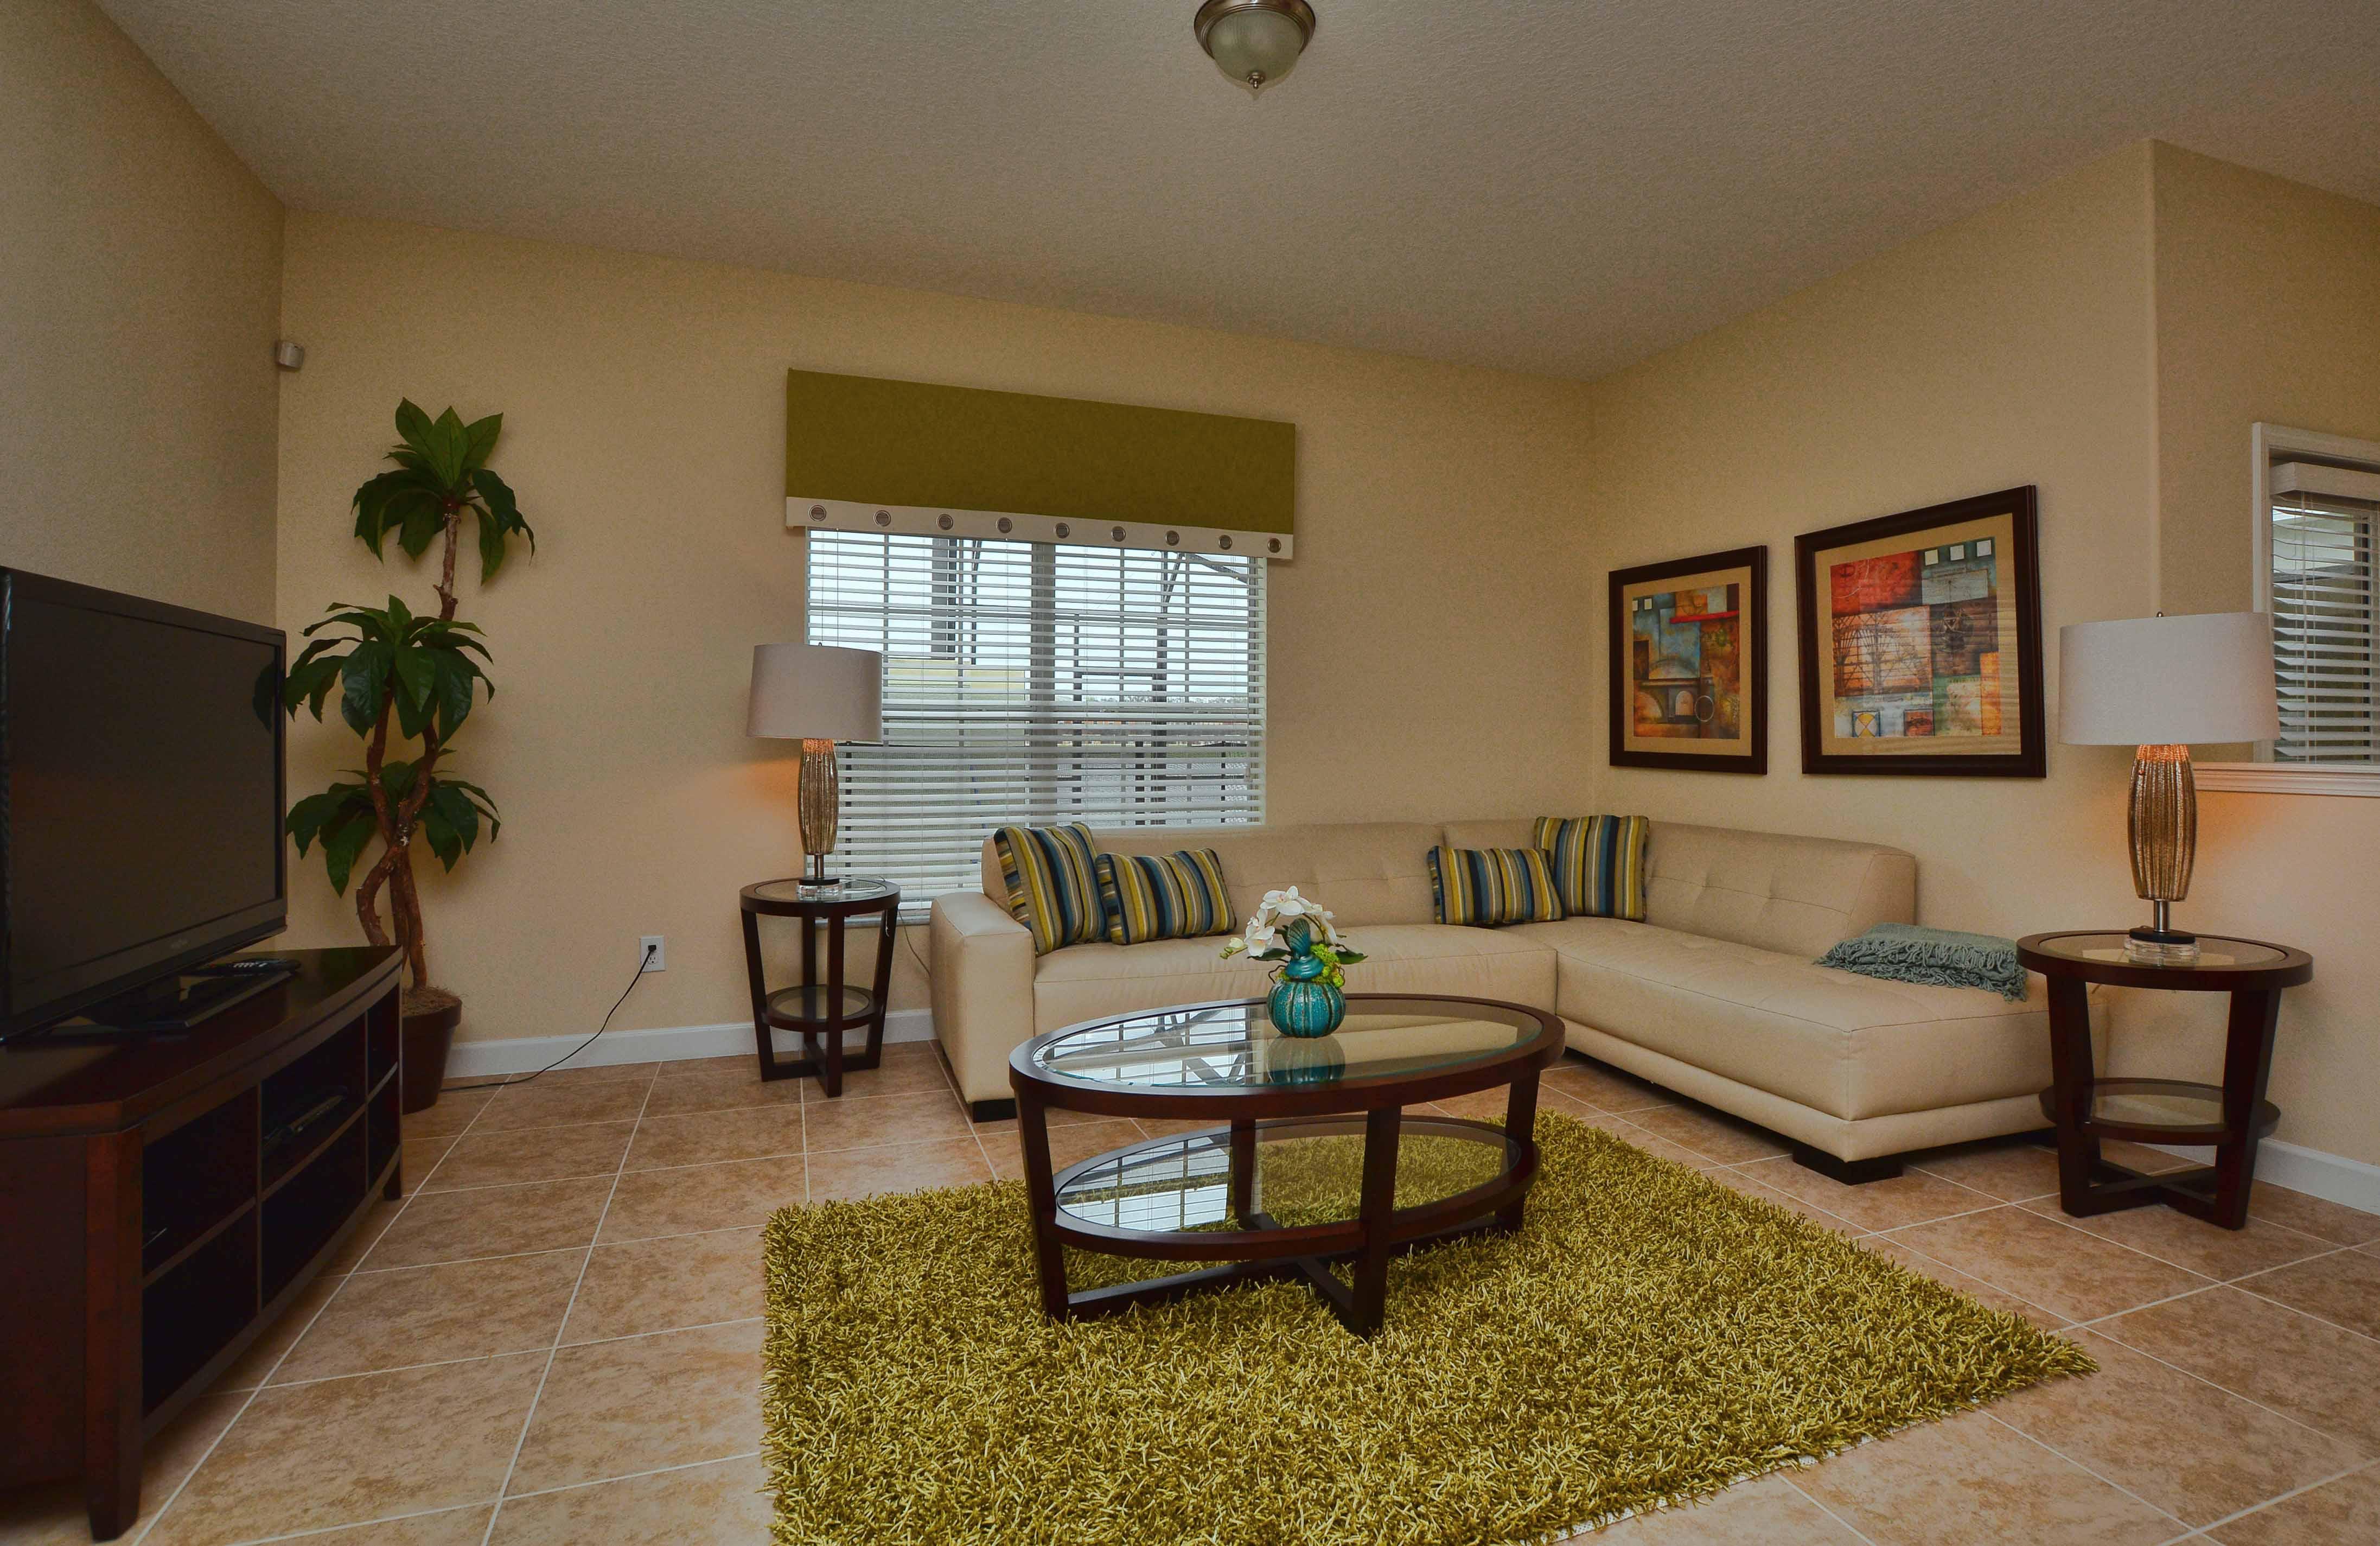 5 Bed Short Term Rental House Paradise Palms